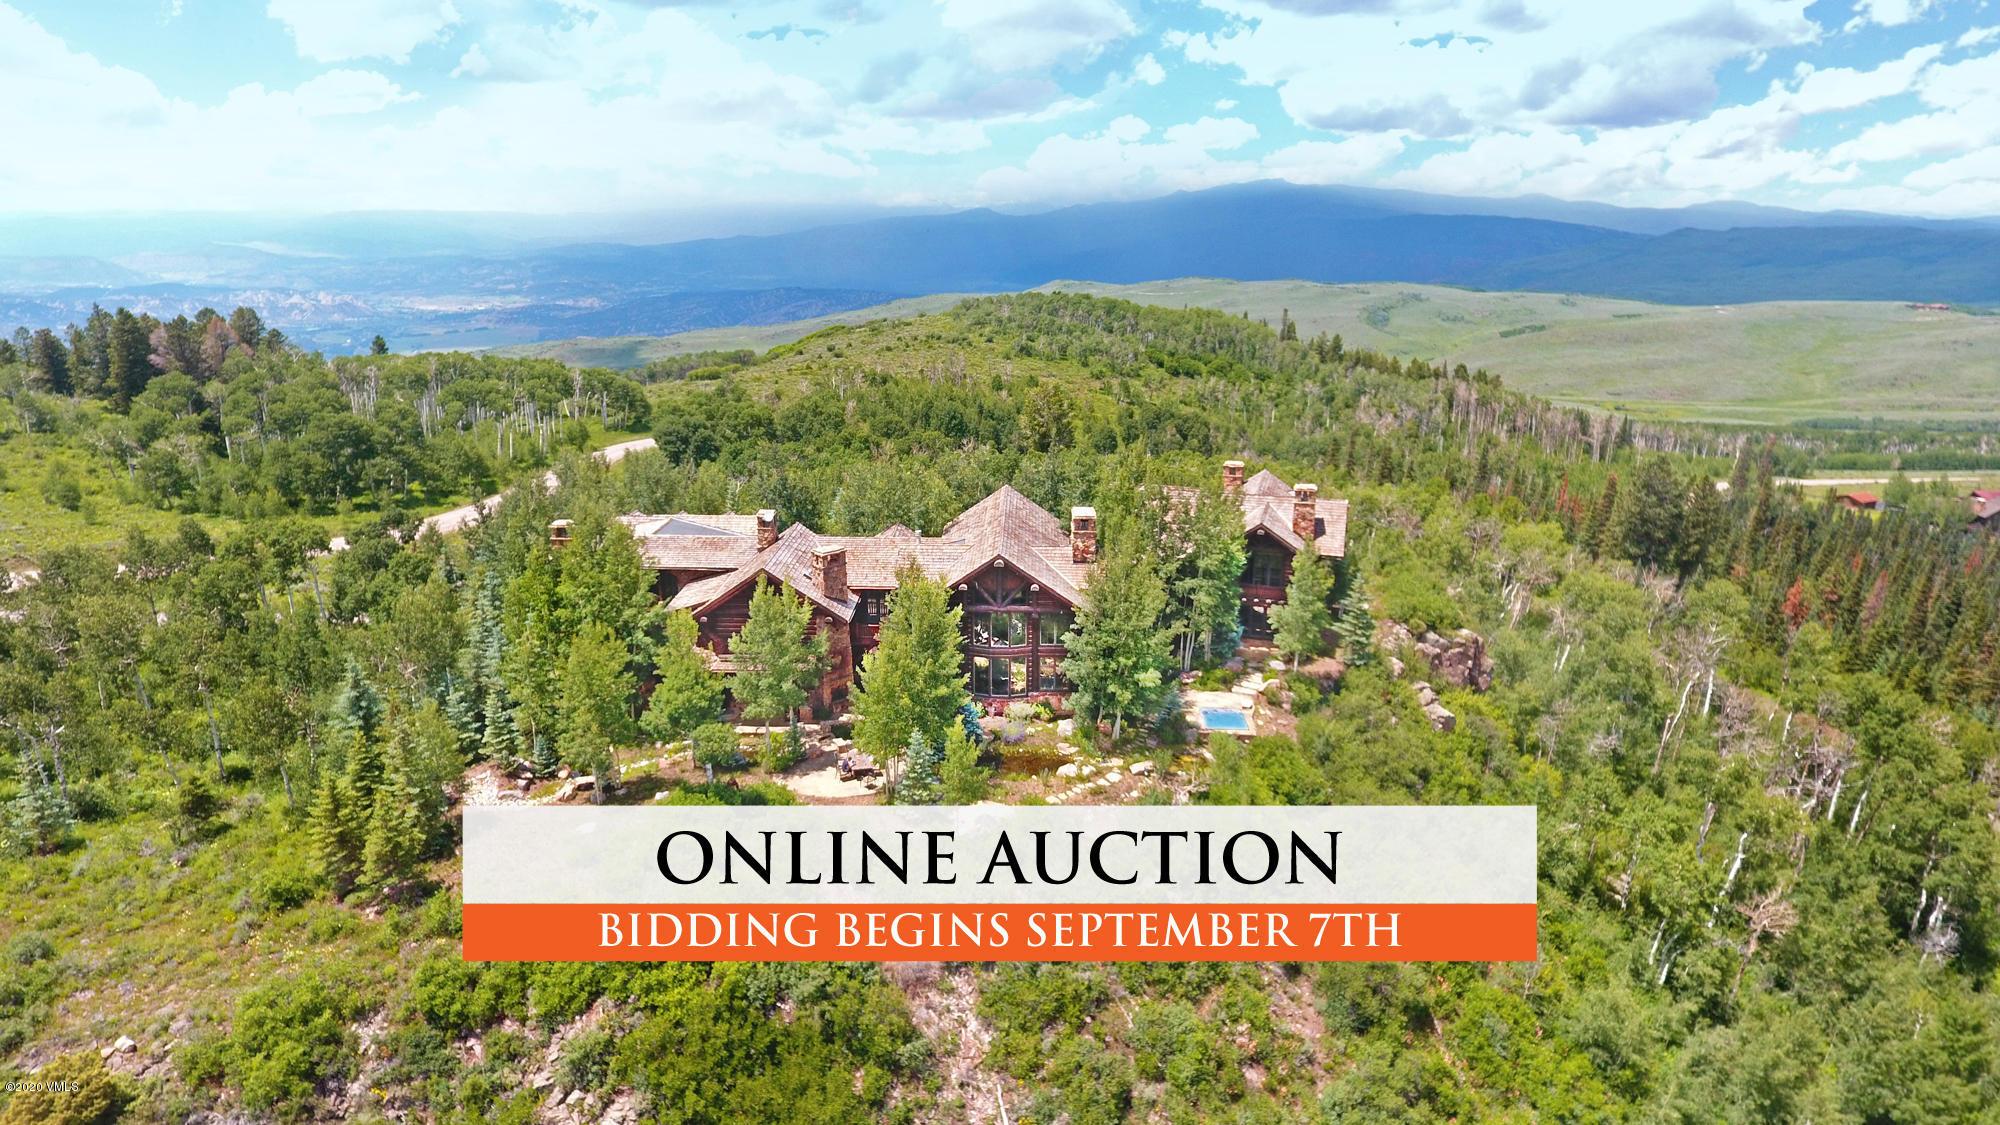 Property image for 672 Webb Peak